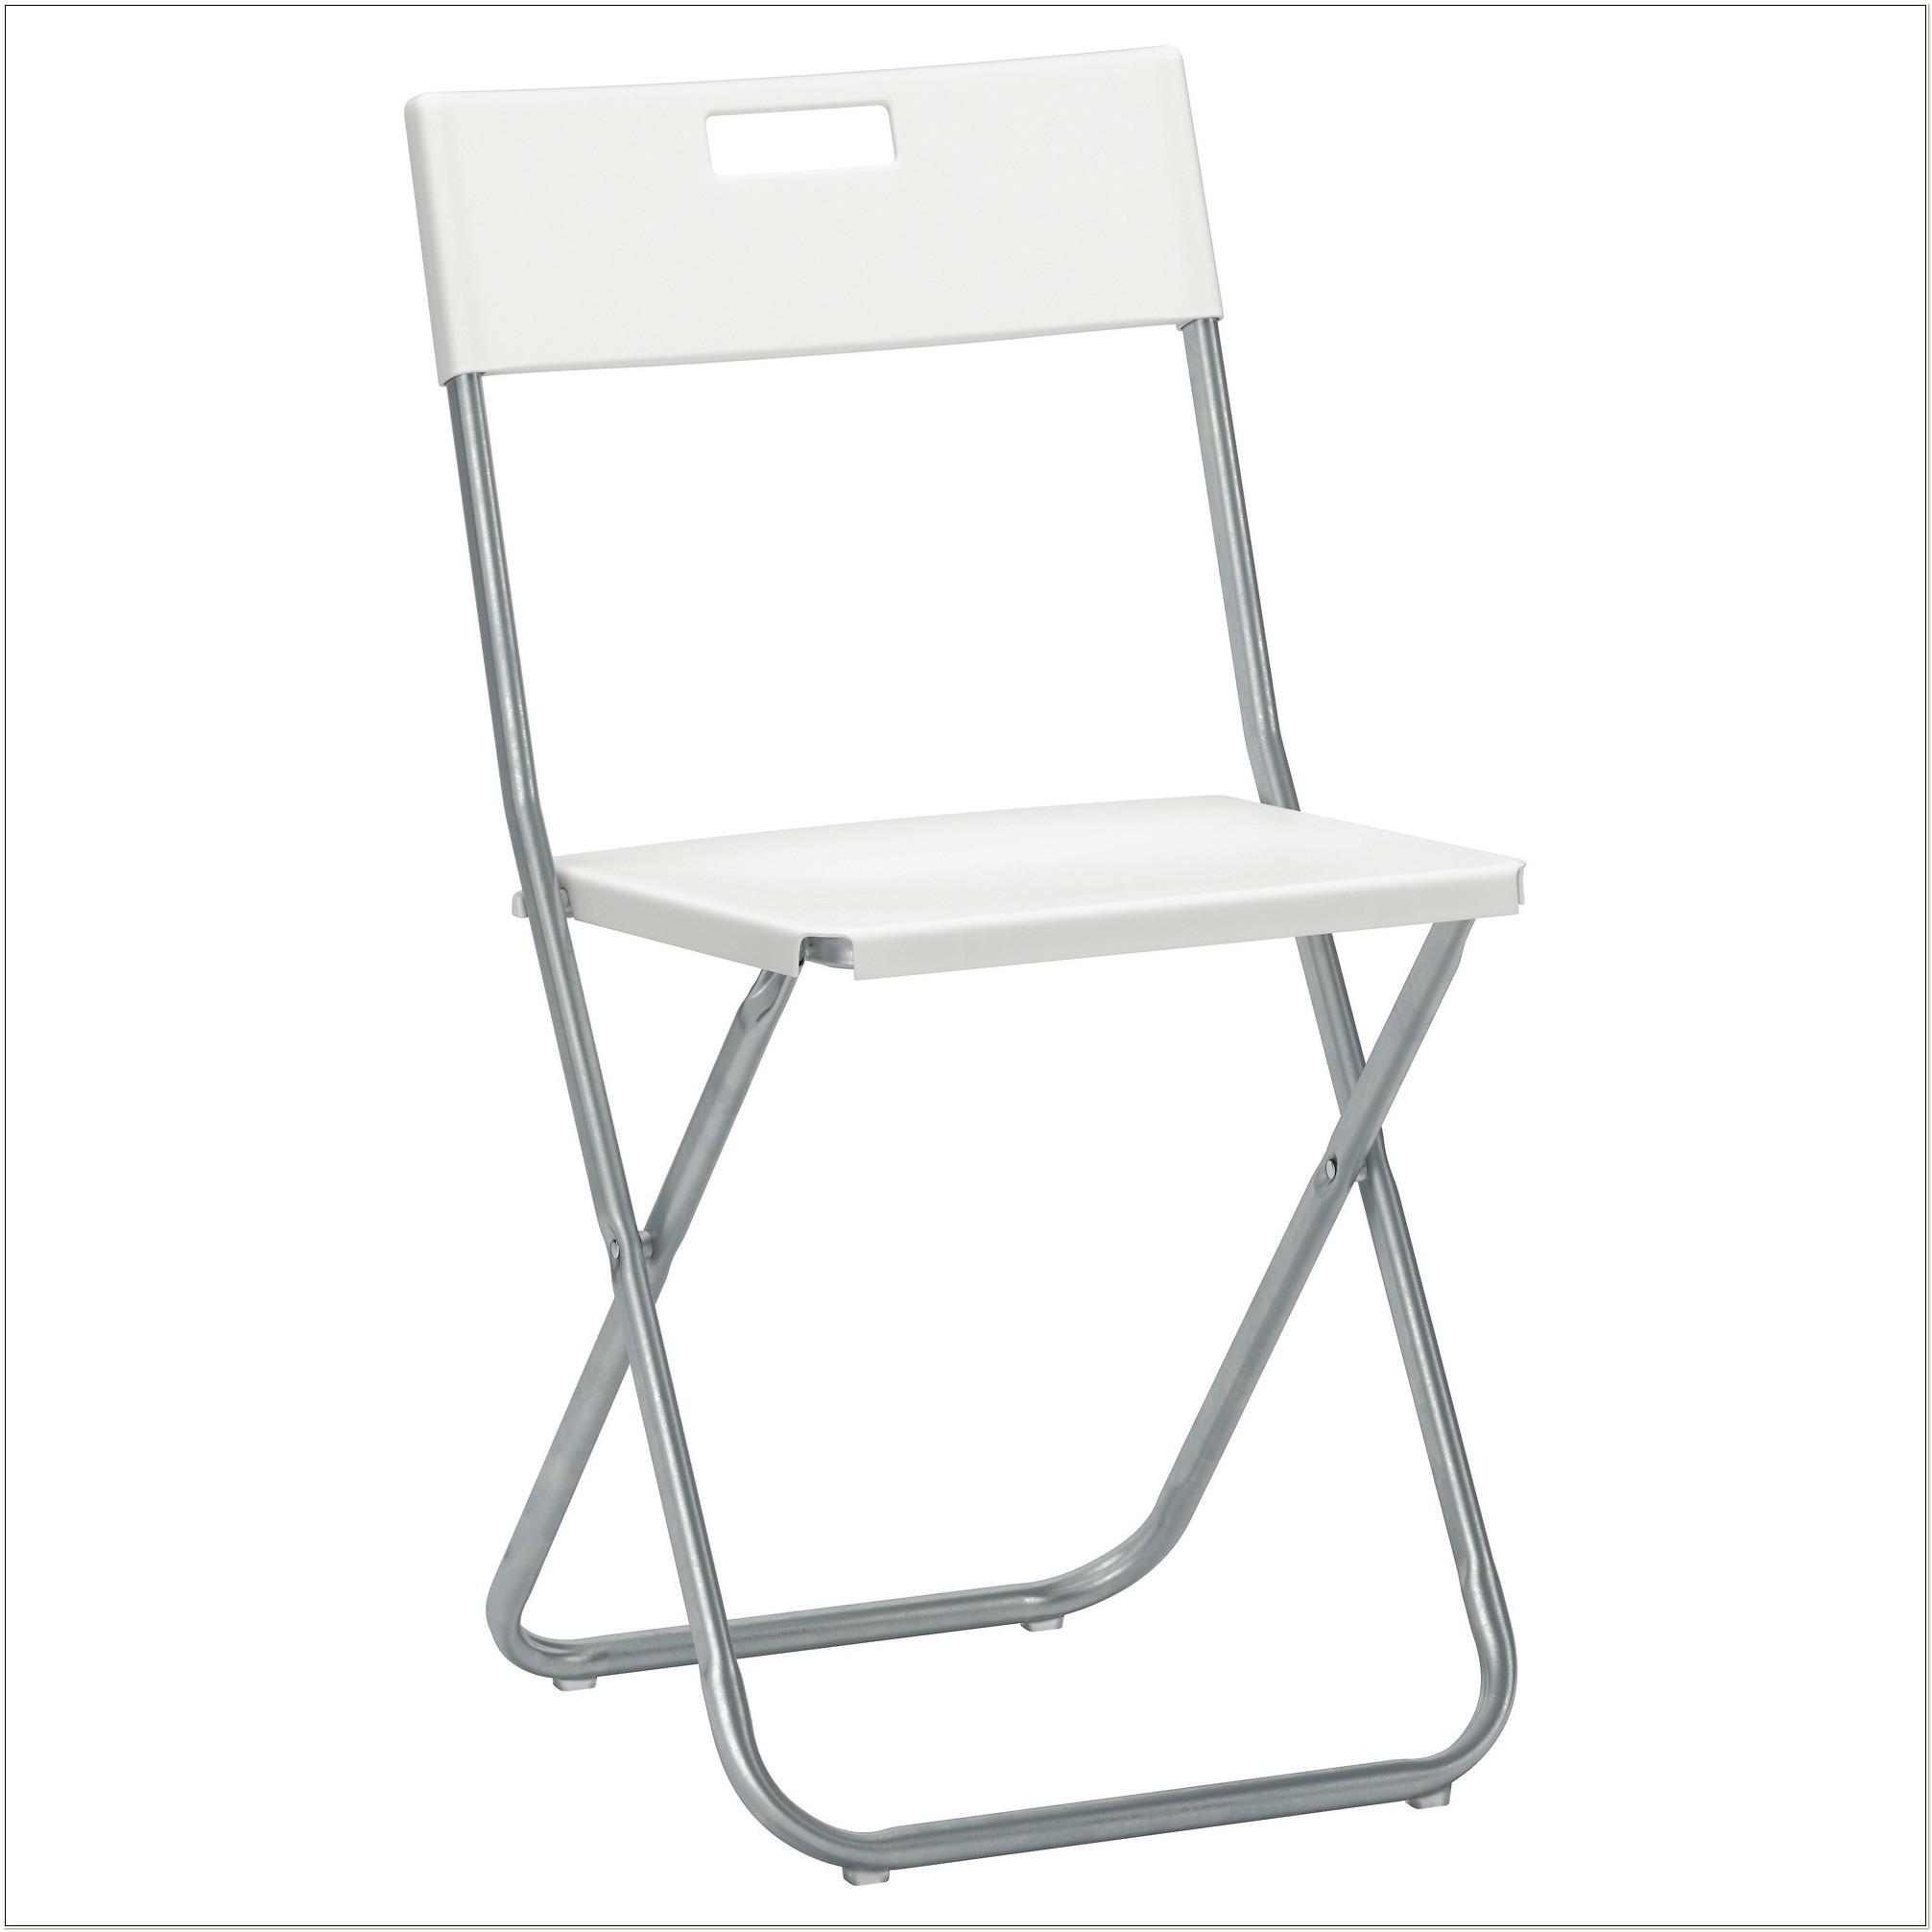 Ikea White Plastic Folding Chairs